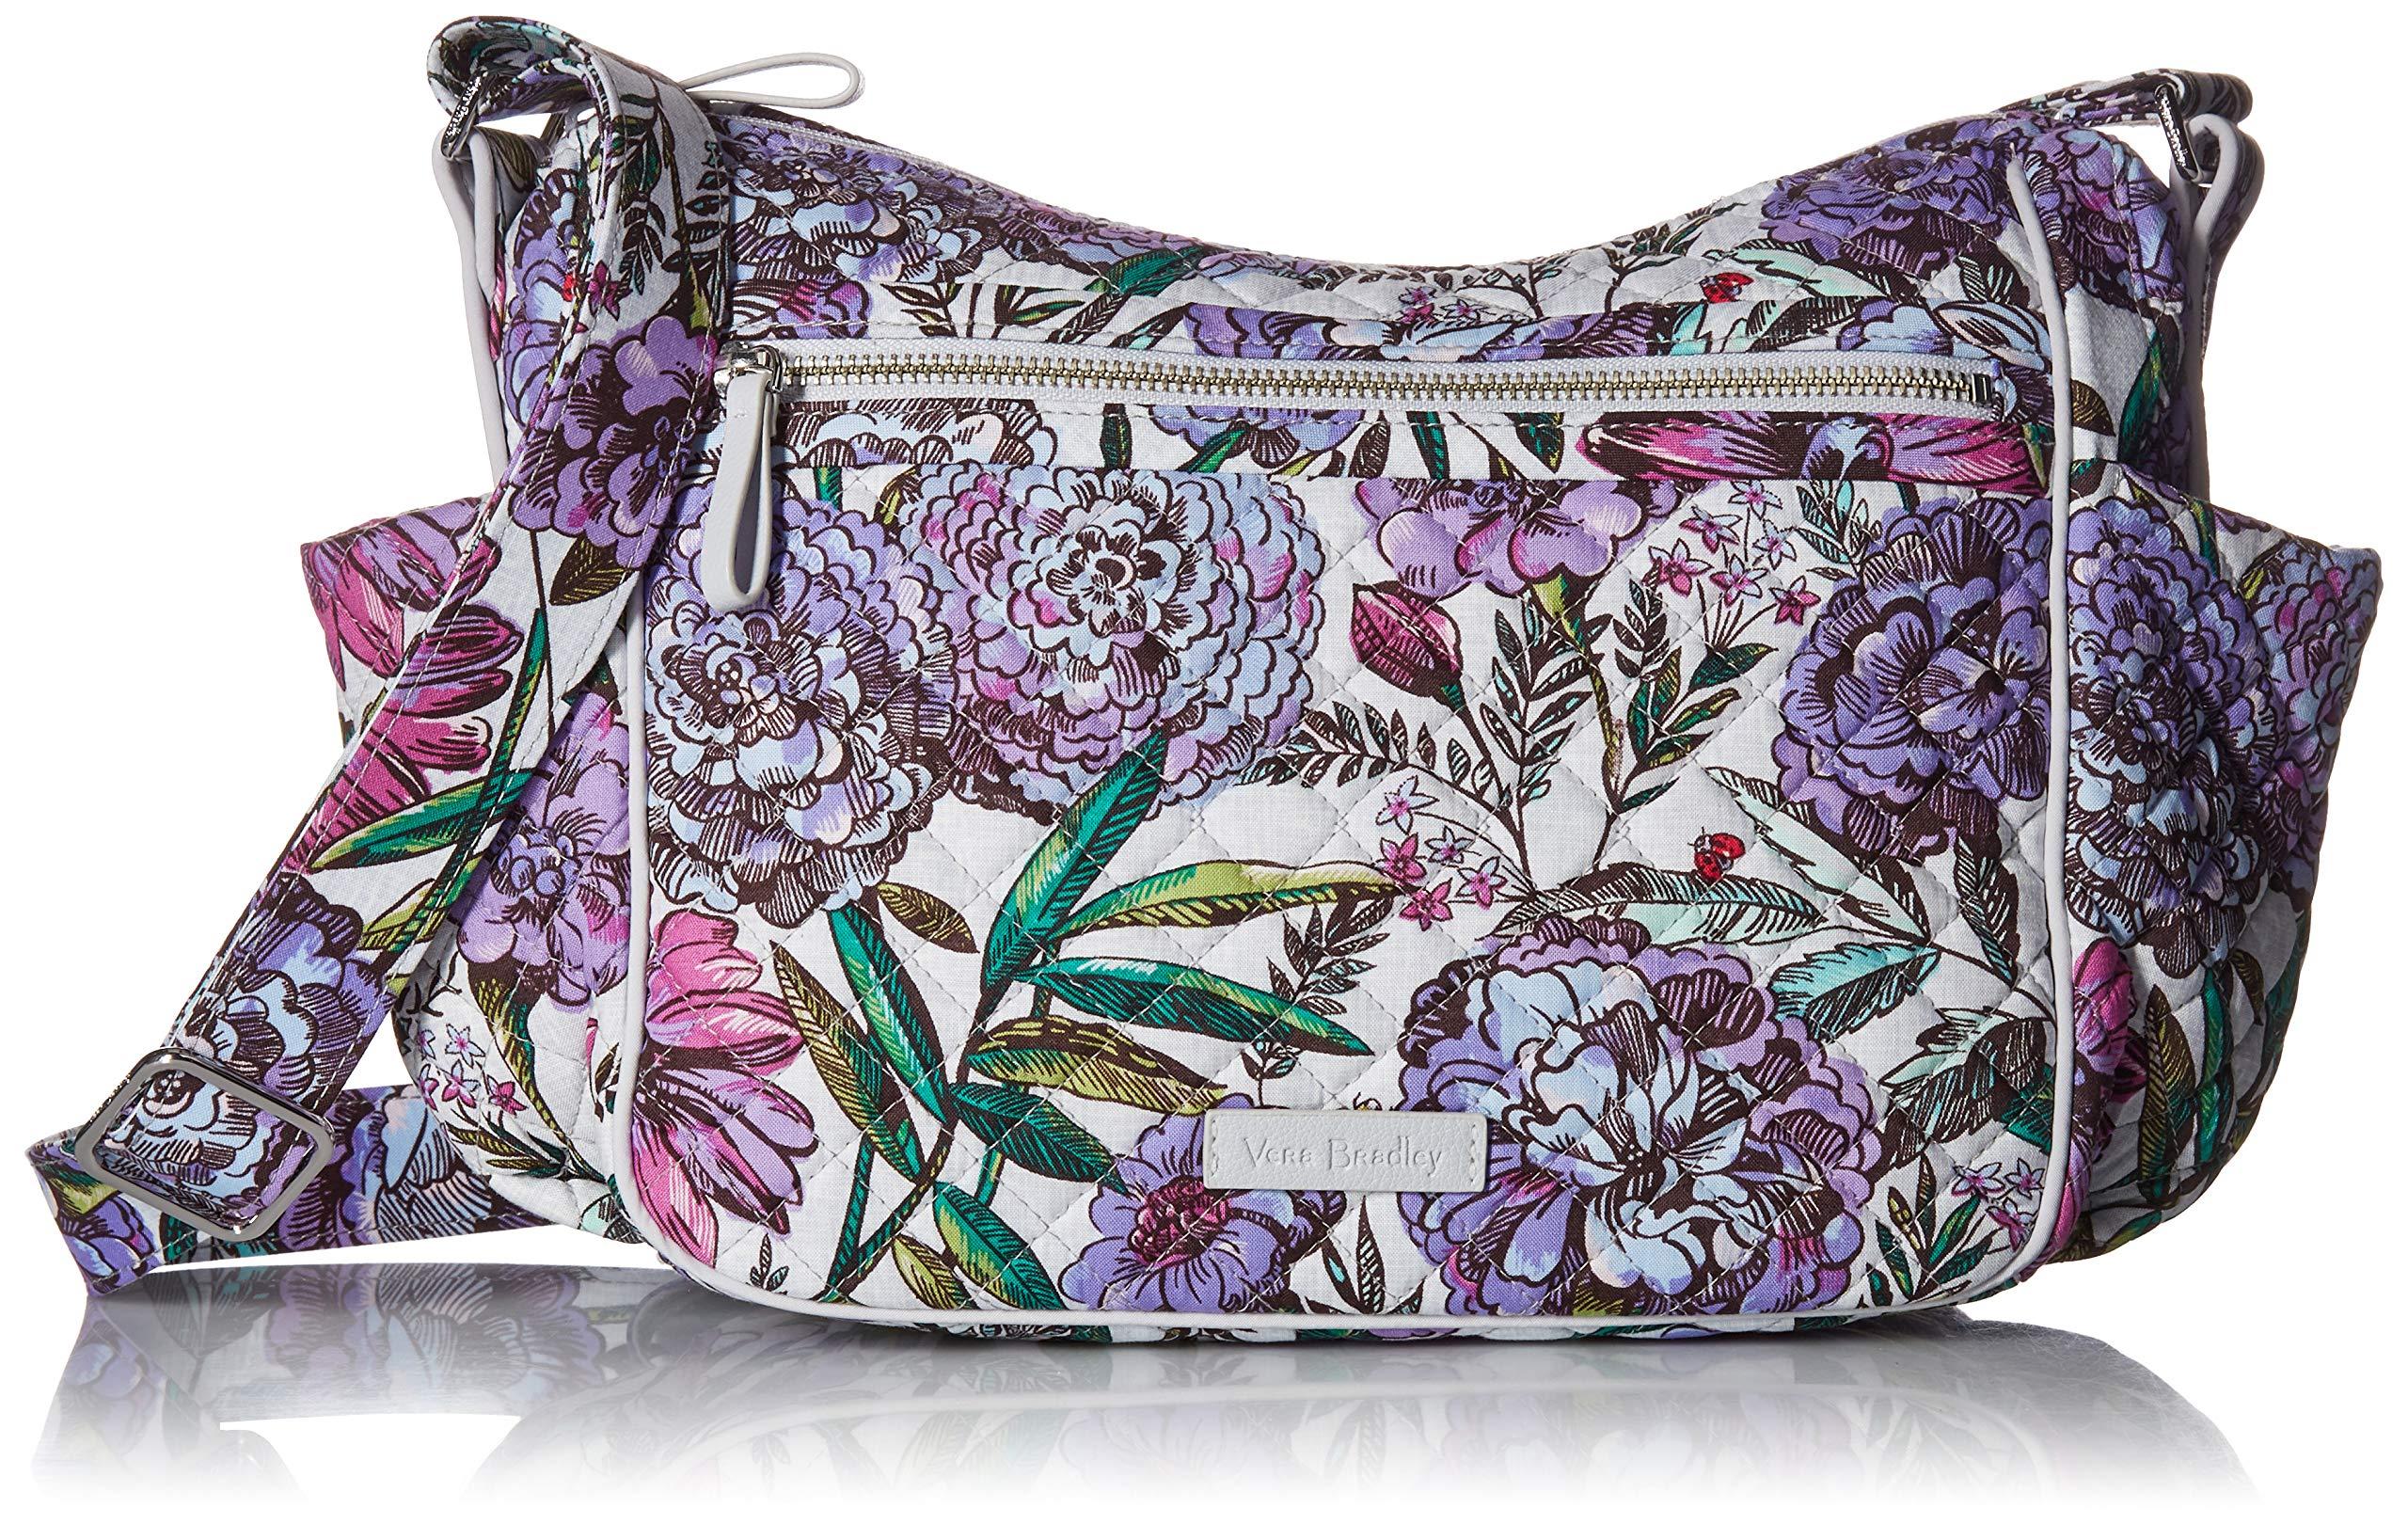 Vera Bradley Iconic On The Go Crossbody, Signature Cotton, Lavender Meadow